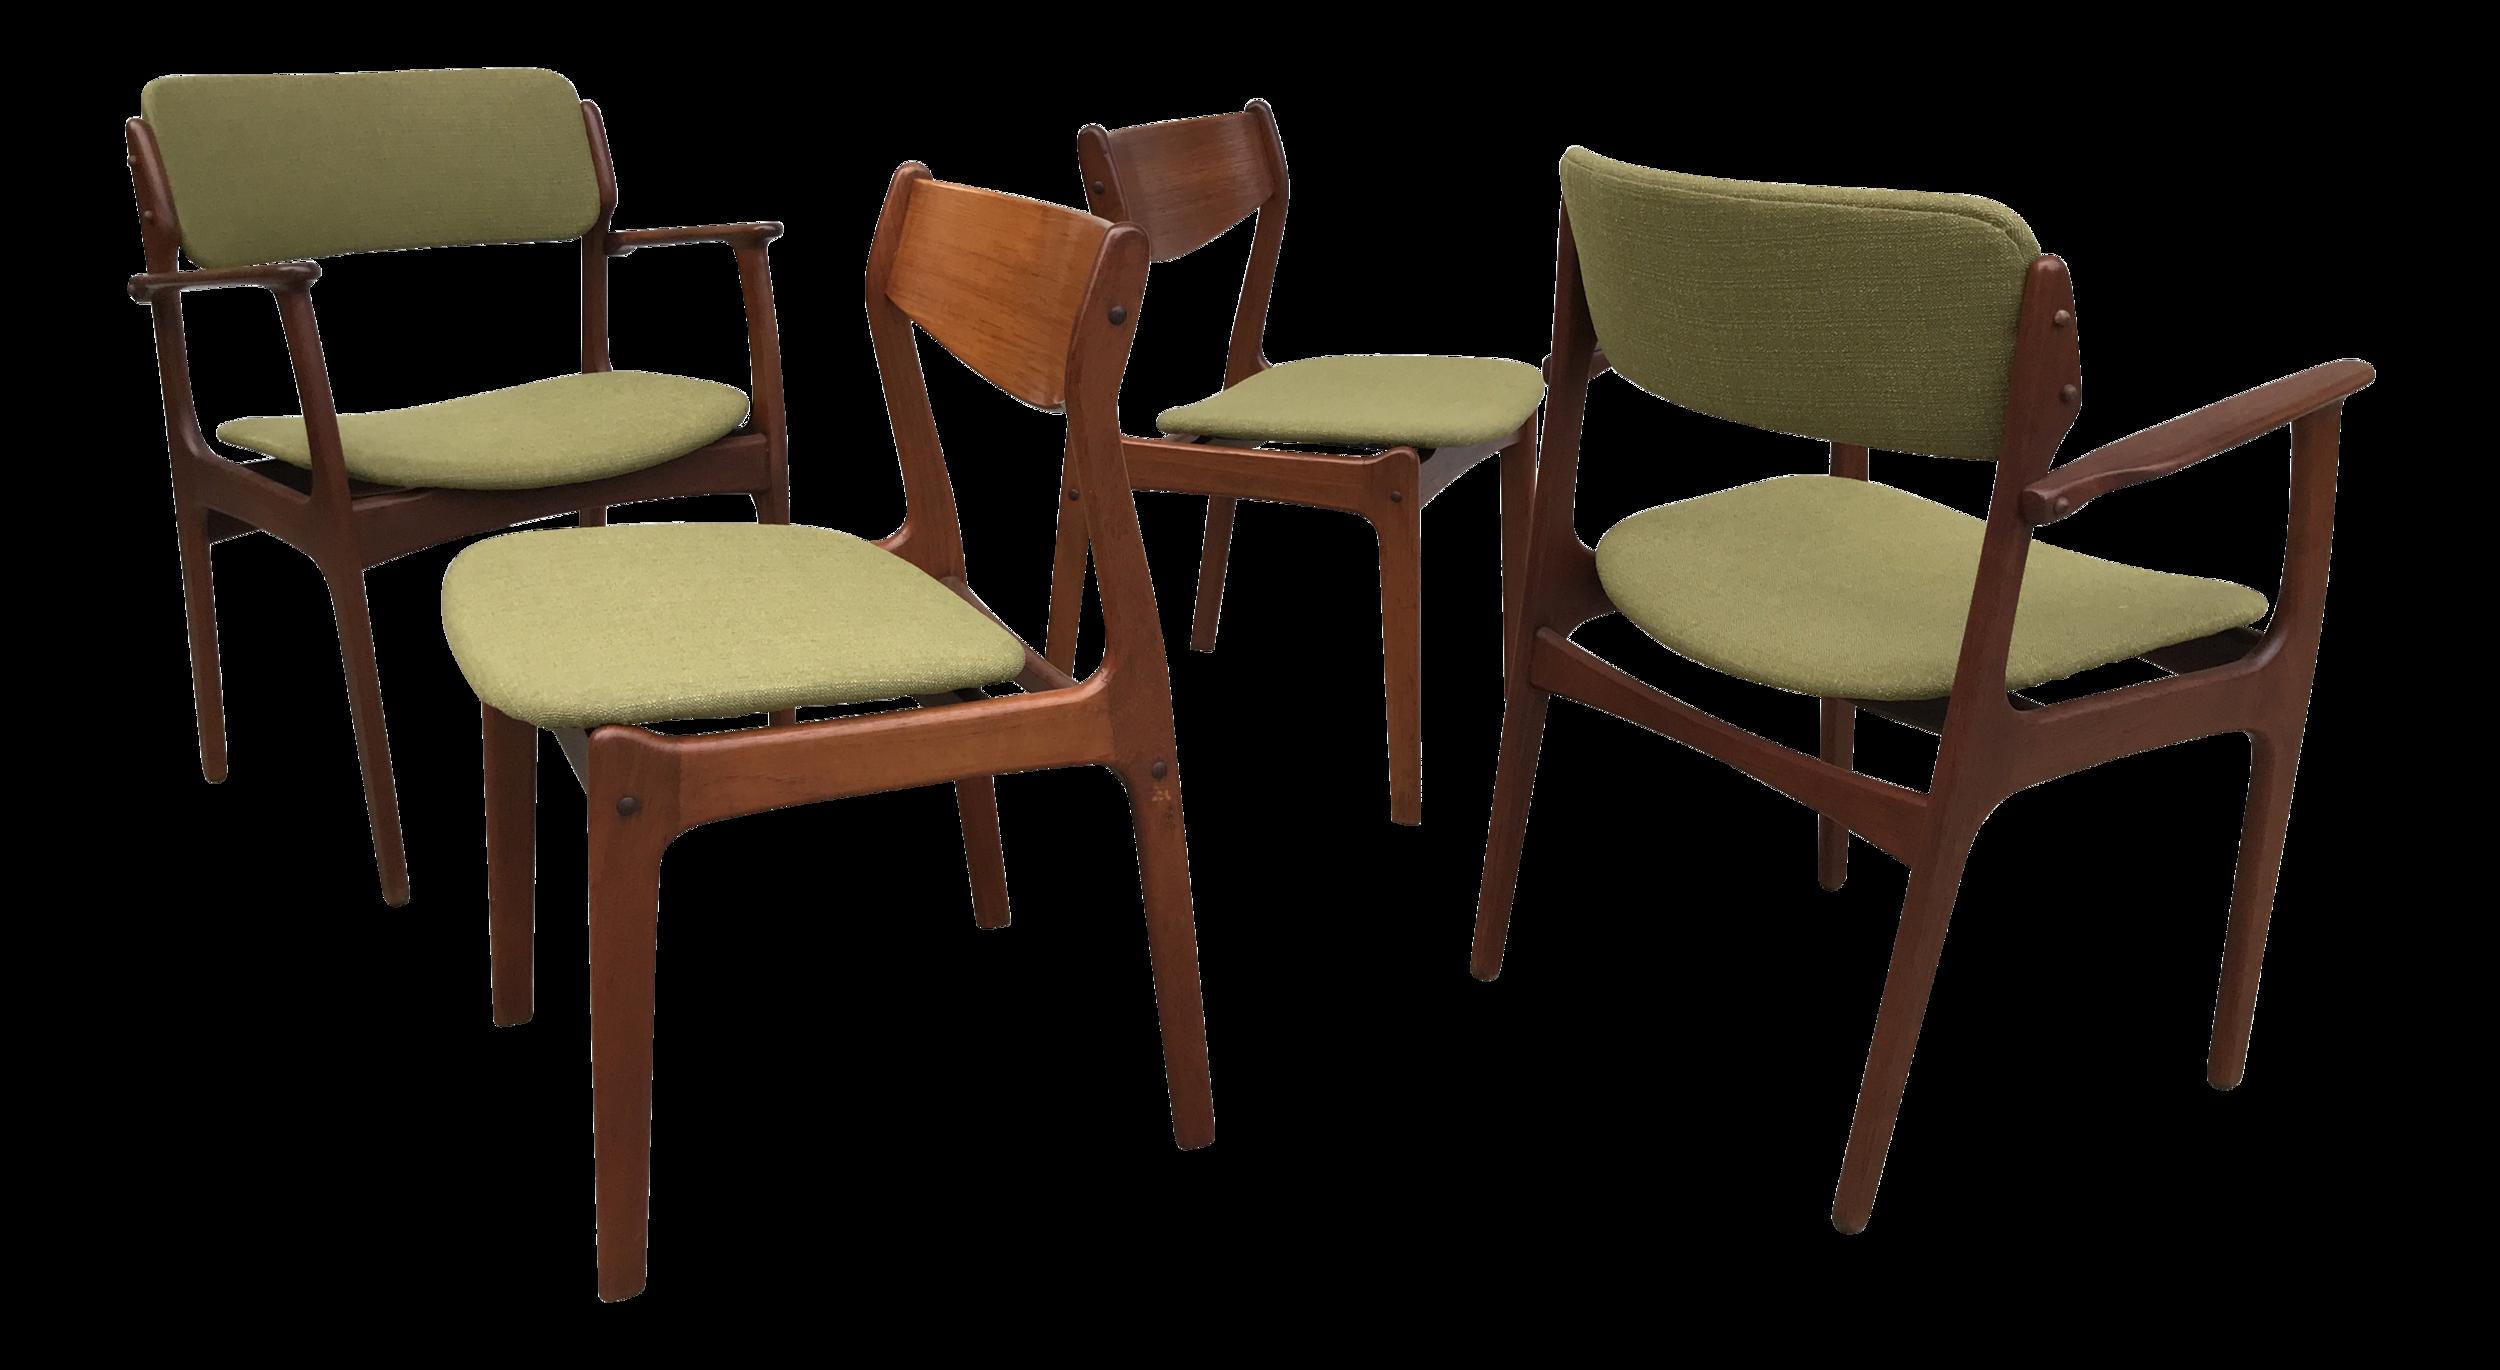 1950s Danish Modern Green Upholstred Teak Dining Chairs - Set of 4